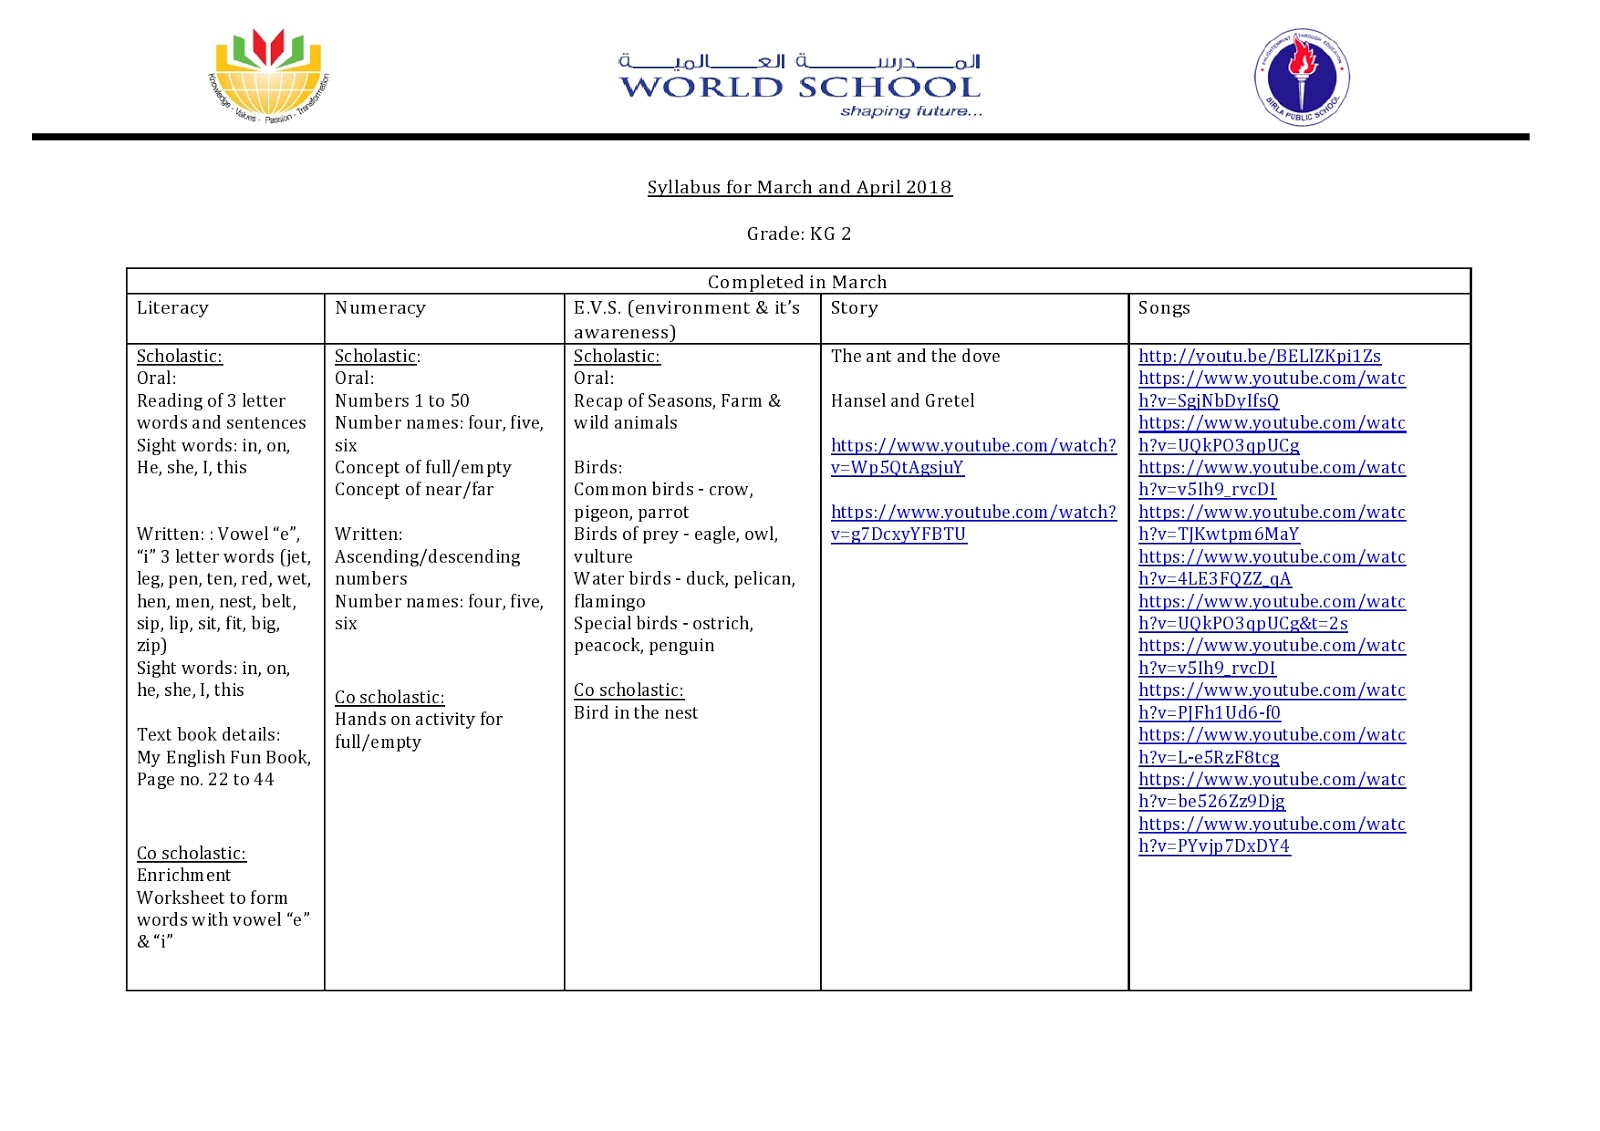 WORLD SCHOOL OMAN: Monthly Planner for KG2 - April 2018